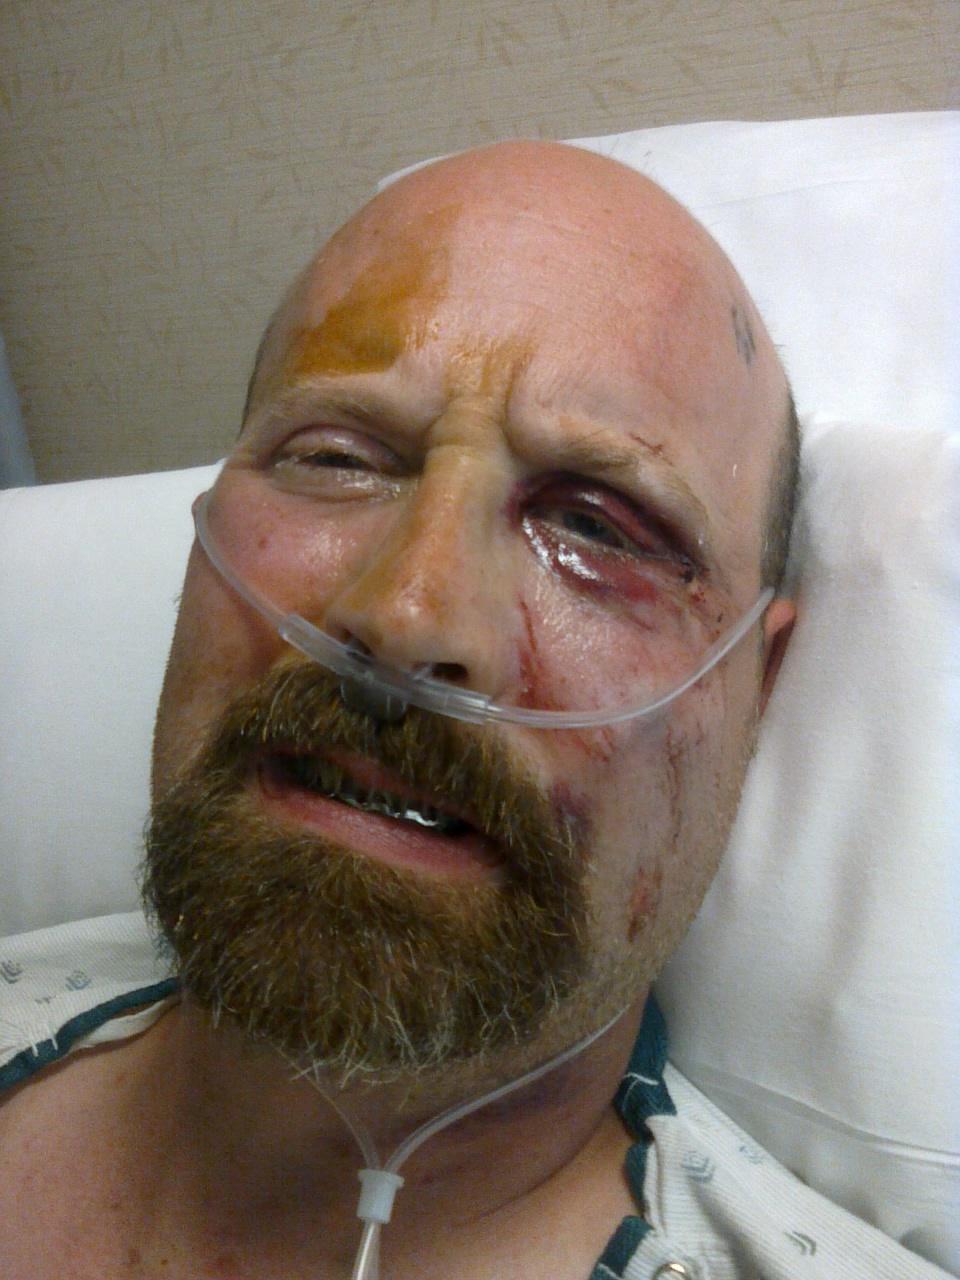 moonshiner\'s rough riders: jaw wired shut, titanium in body